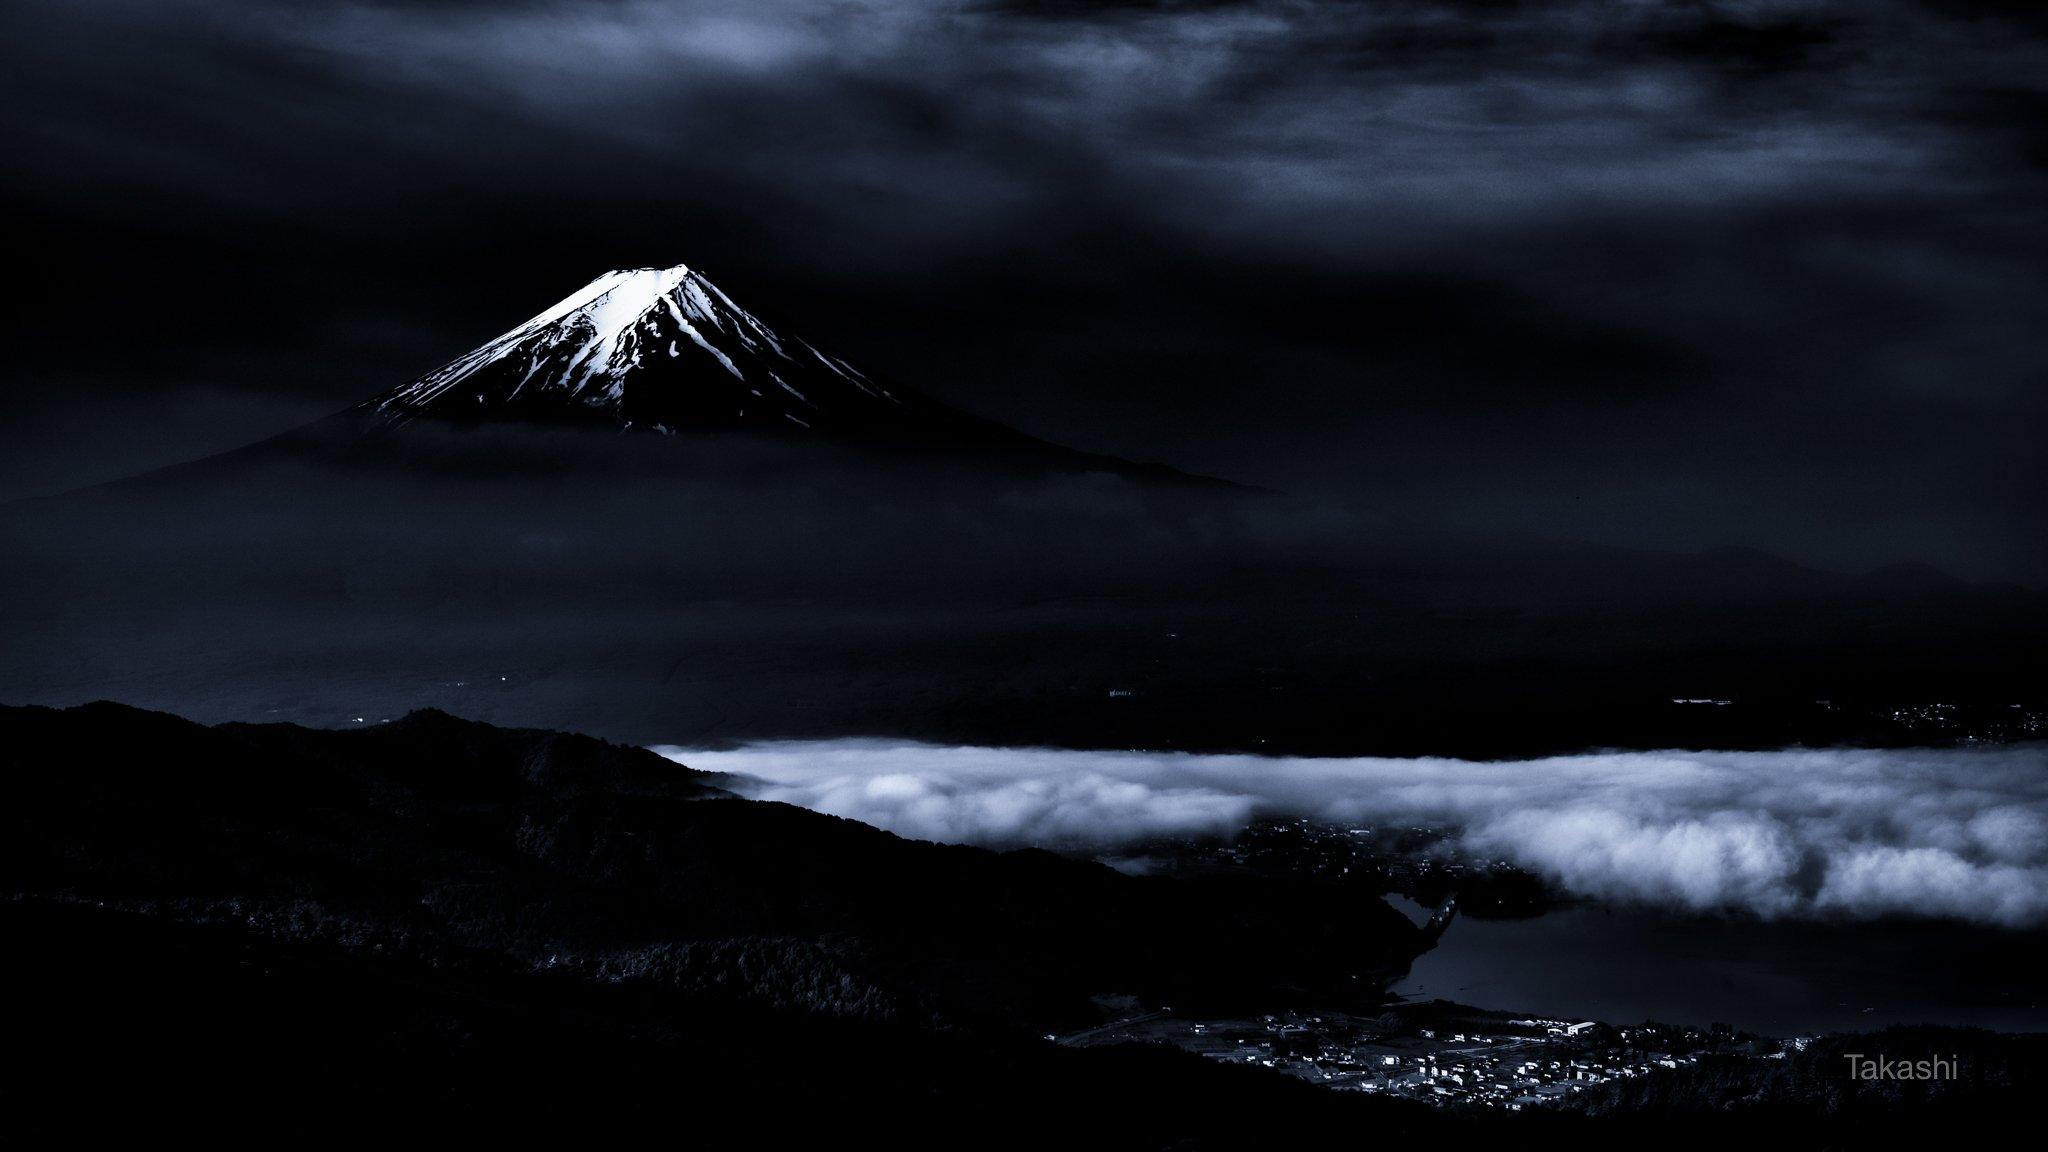 Fuji,mountain,Japan,clouds,snow,lake,scenery,beautiful,blue,amazing,landscape,, Takashi